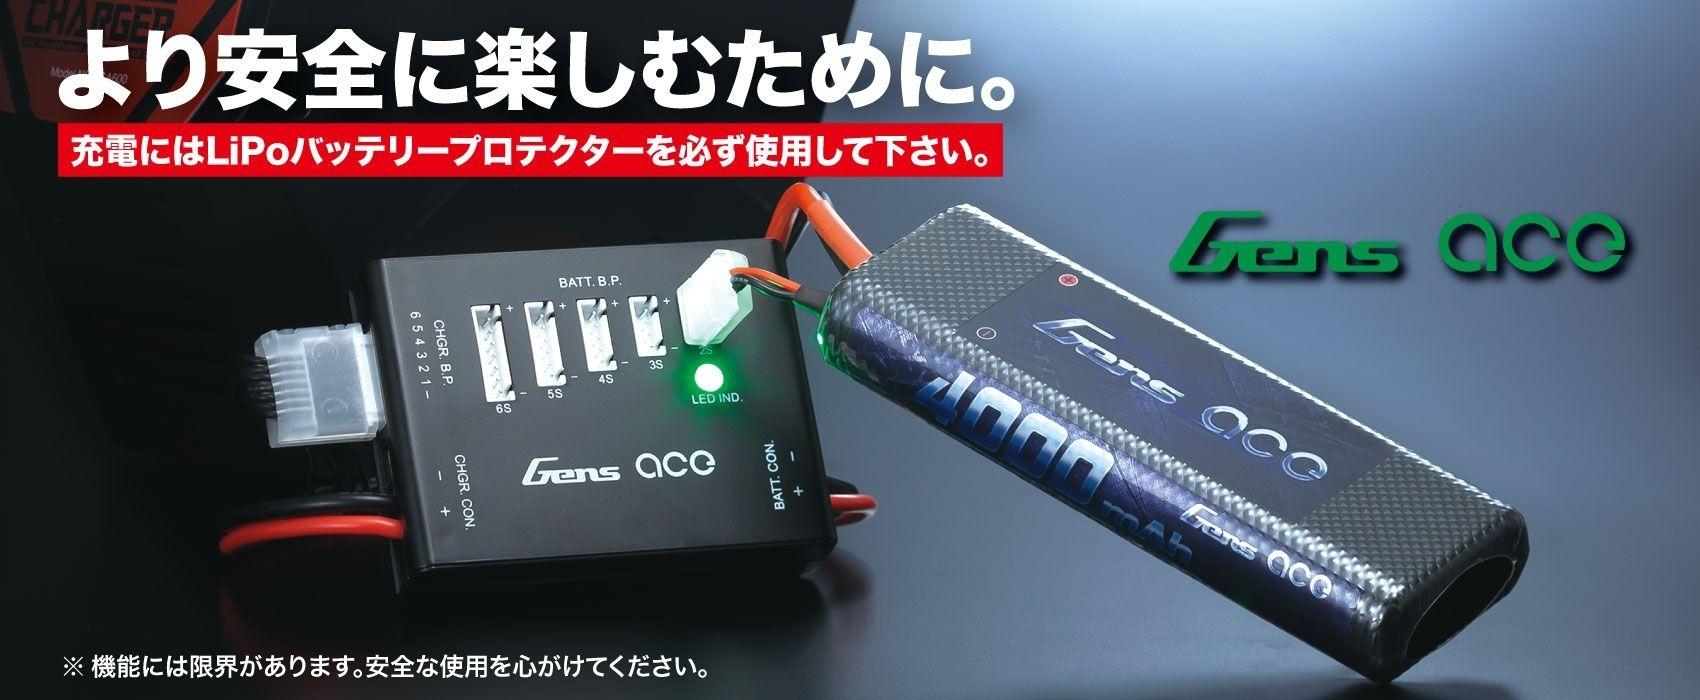 Gens ace LiPoバッテリー